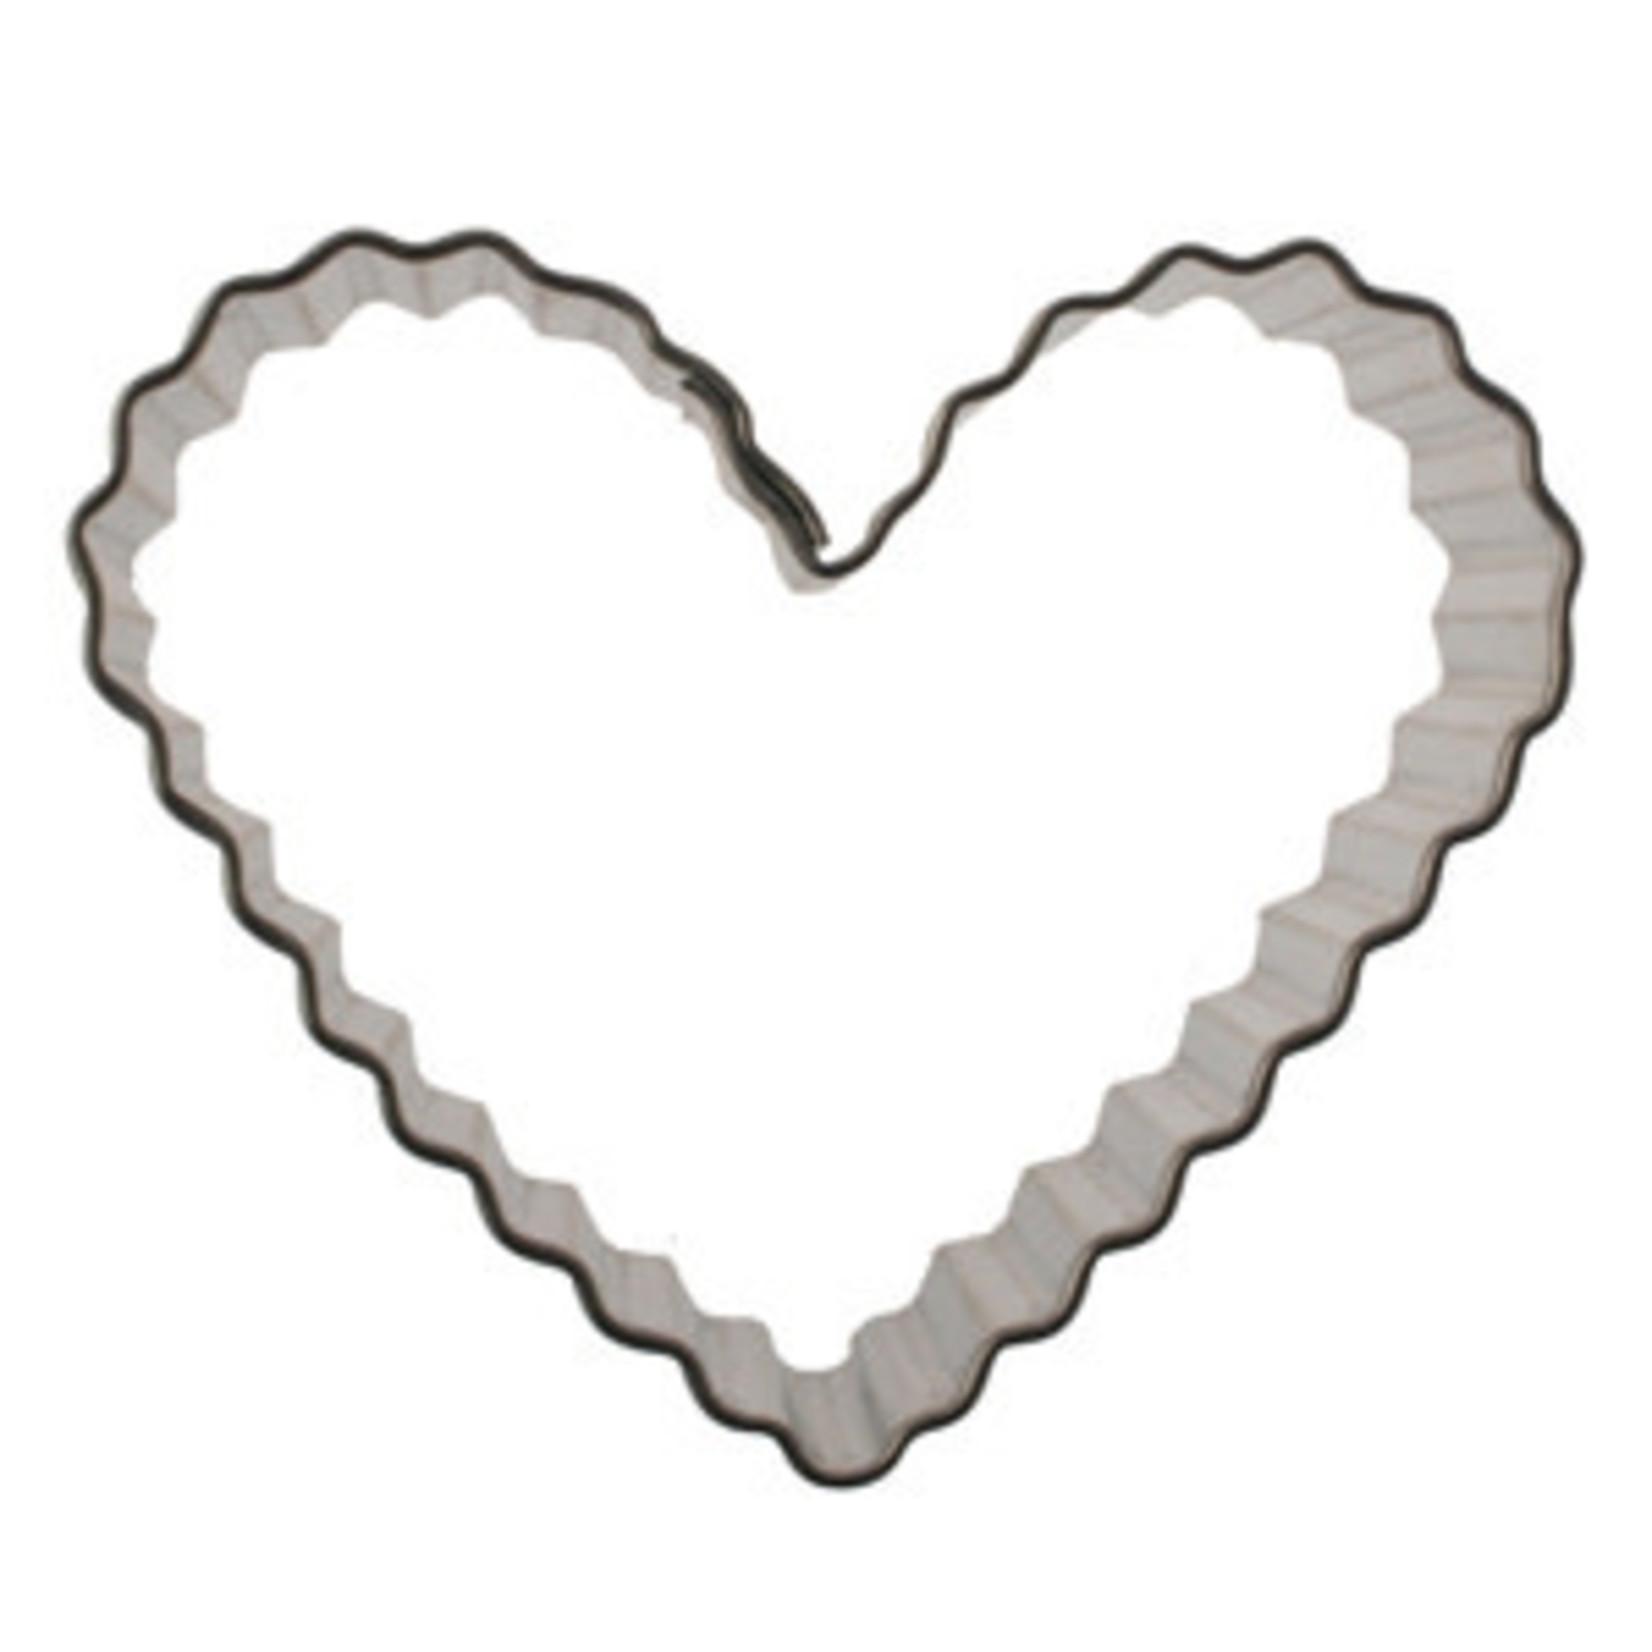 "2.5"" Fluted Heart Cookie Cutter"